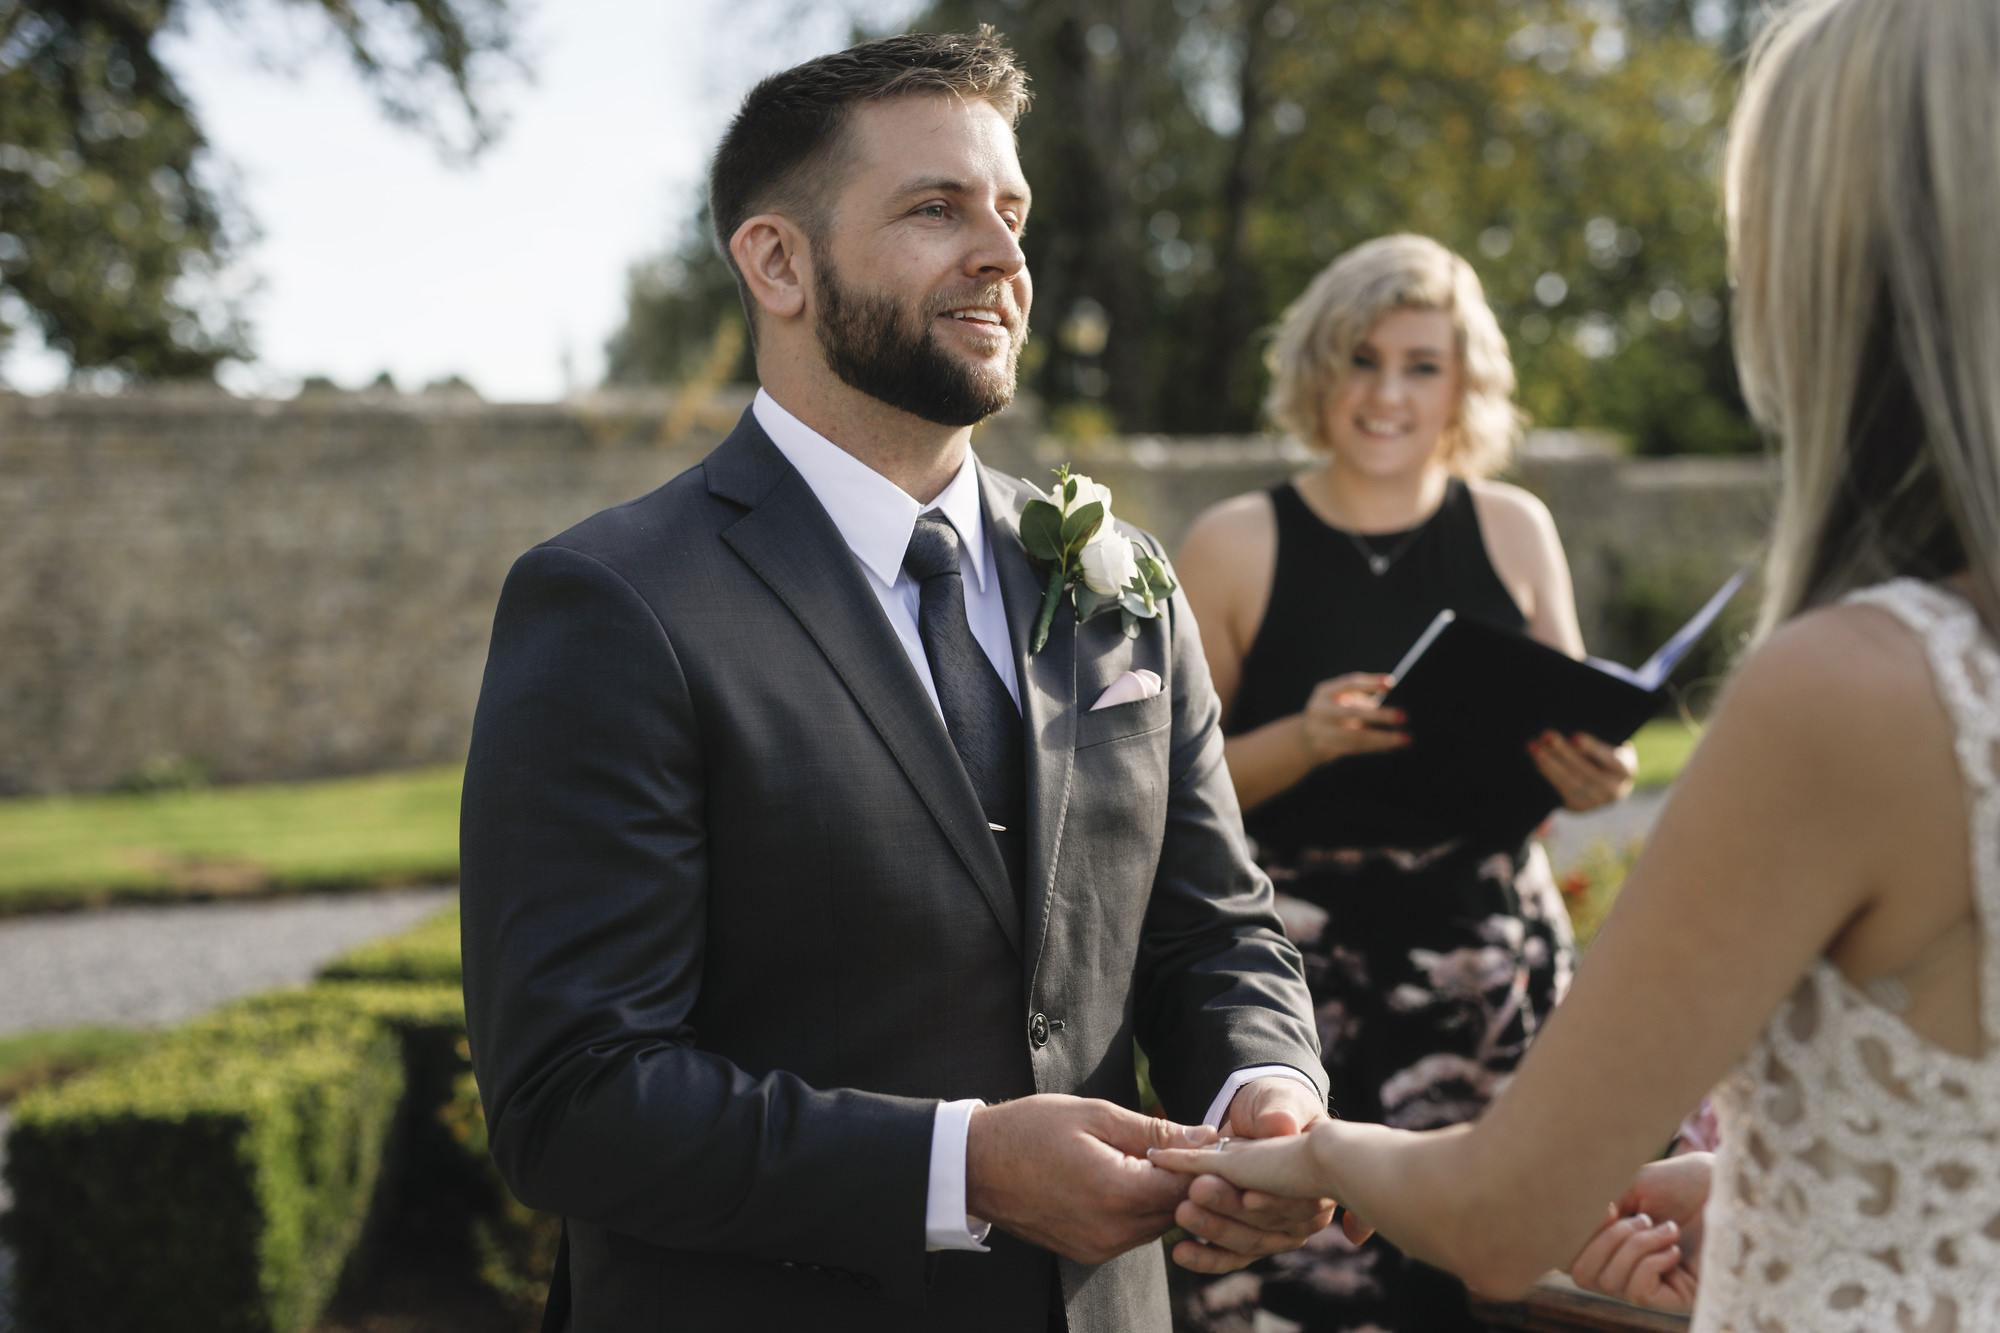 kilkea_castle_wedding_photographer_goldenmoments_030.jpg